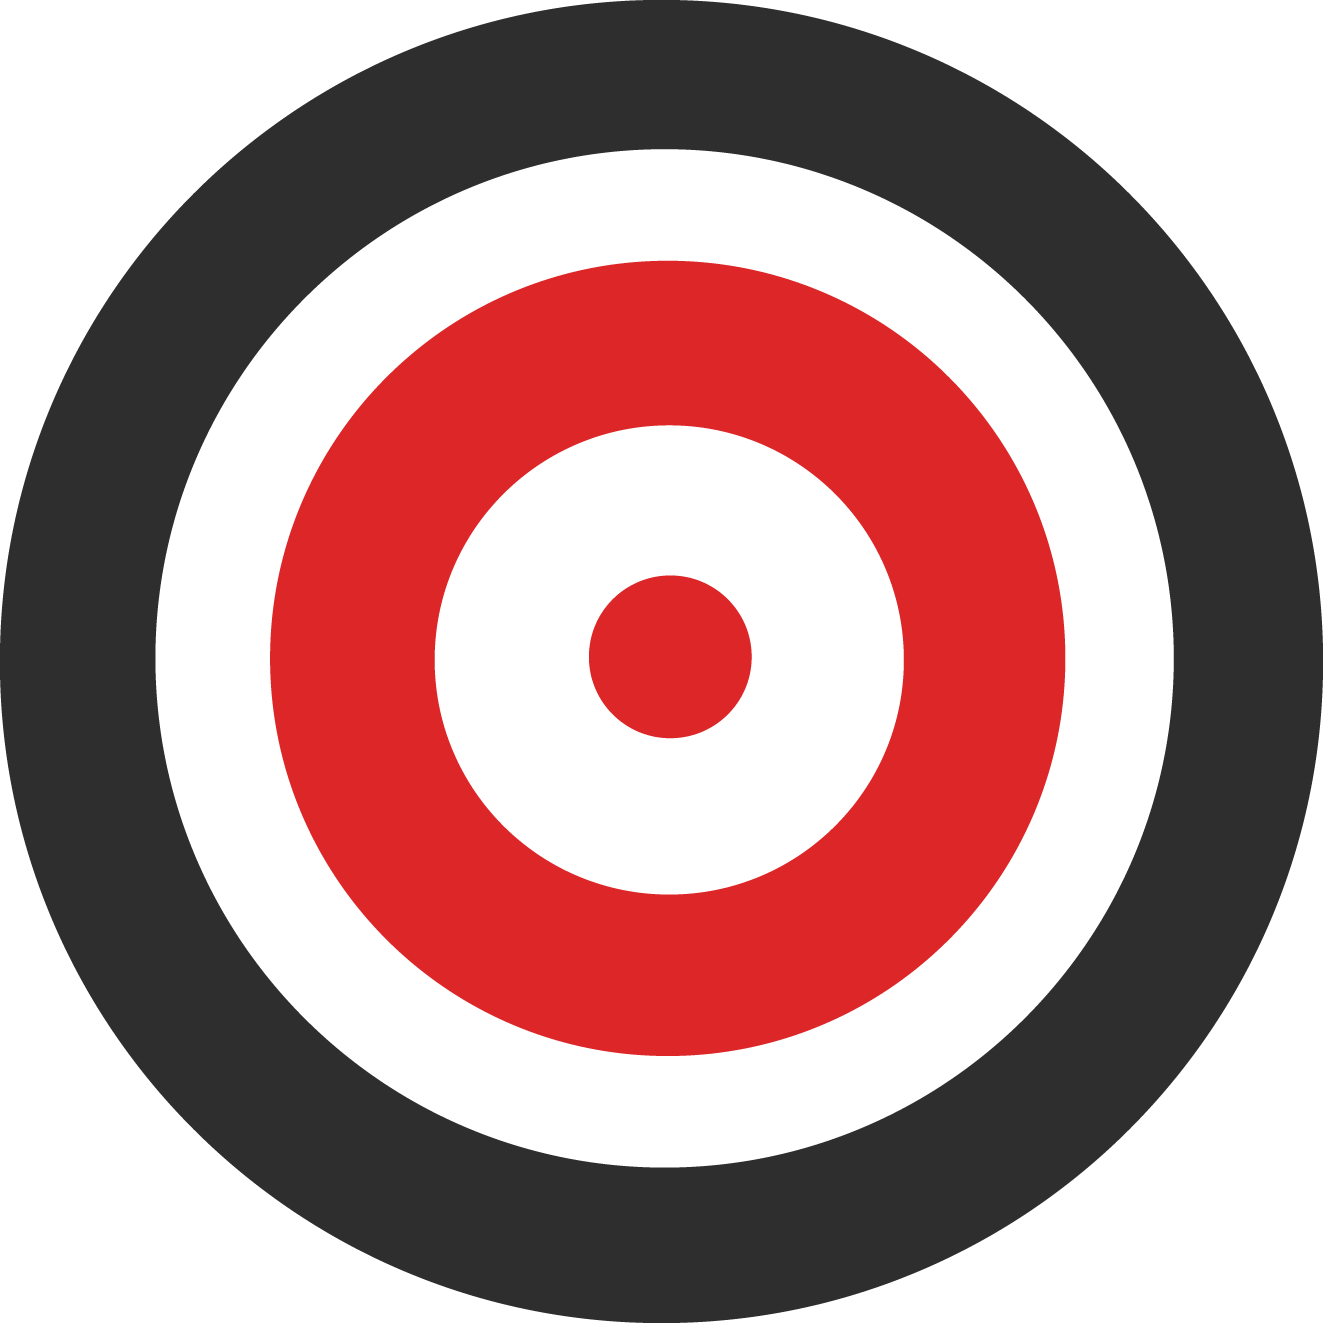 Target_Symbol | Arrows Academy